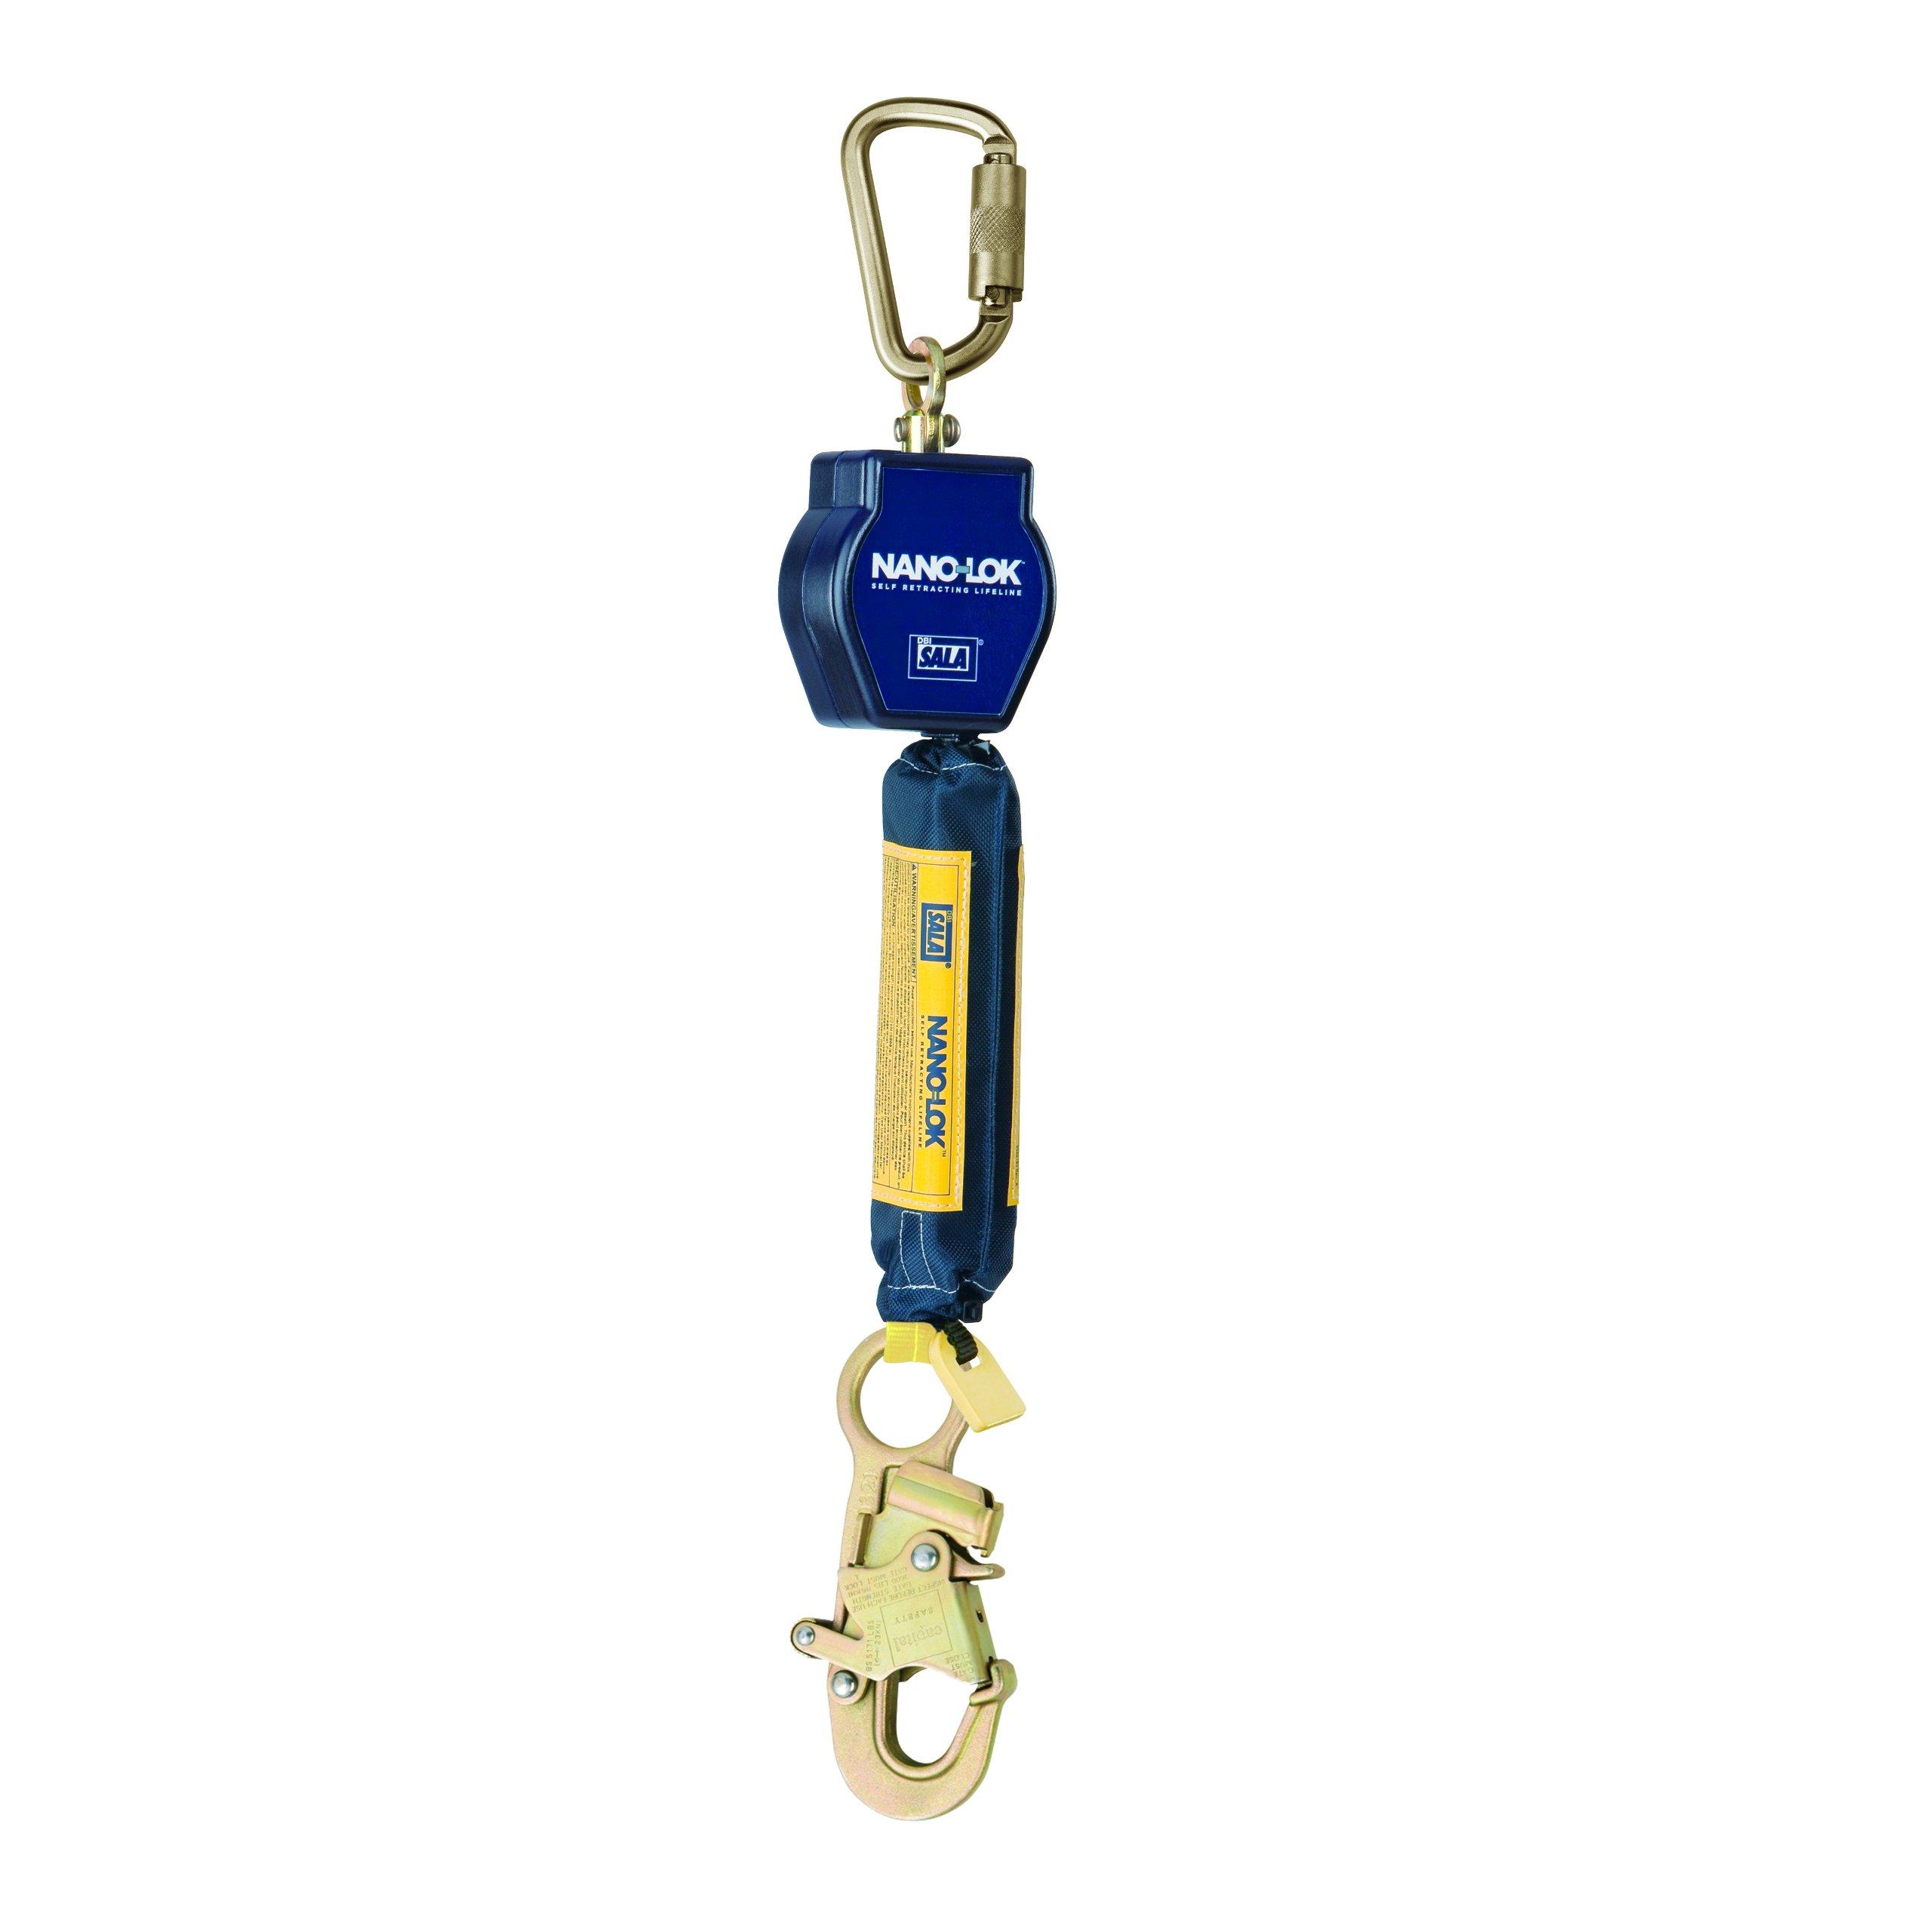 3M DBI-SALA Nano-Lok 3101215 Self Retracting Lifeline, 6', 3/4'' Dynema Polyester Web, Snap Hook, Swiveling Anchor Loop with Carabiner, Blue